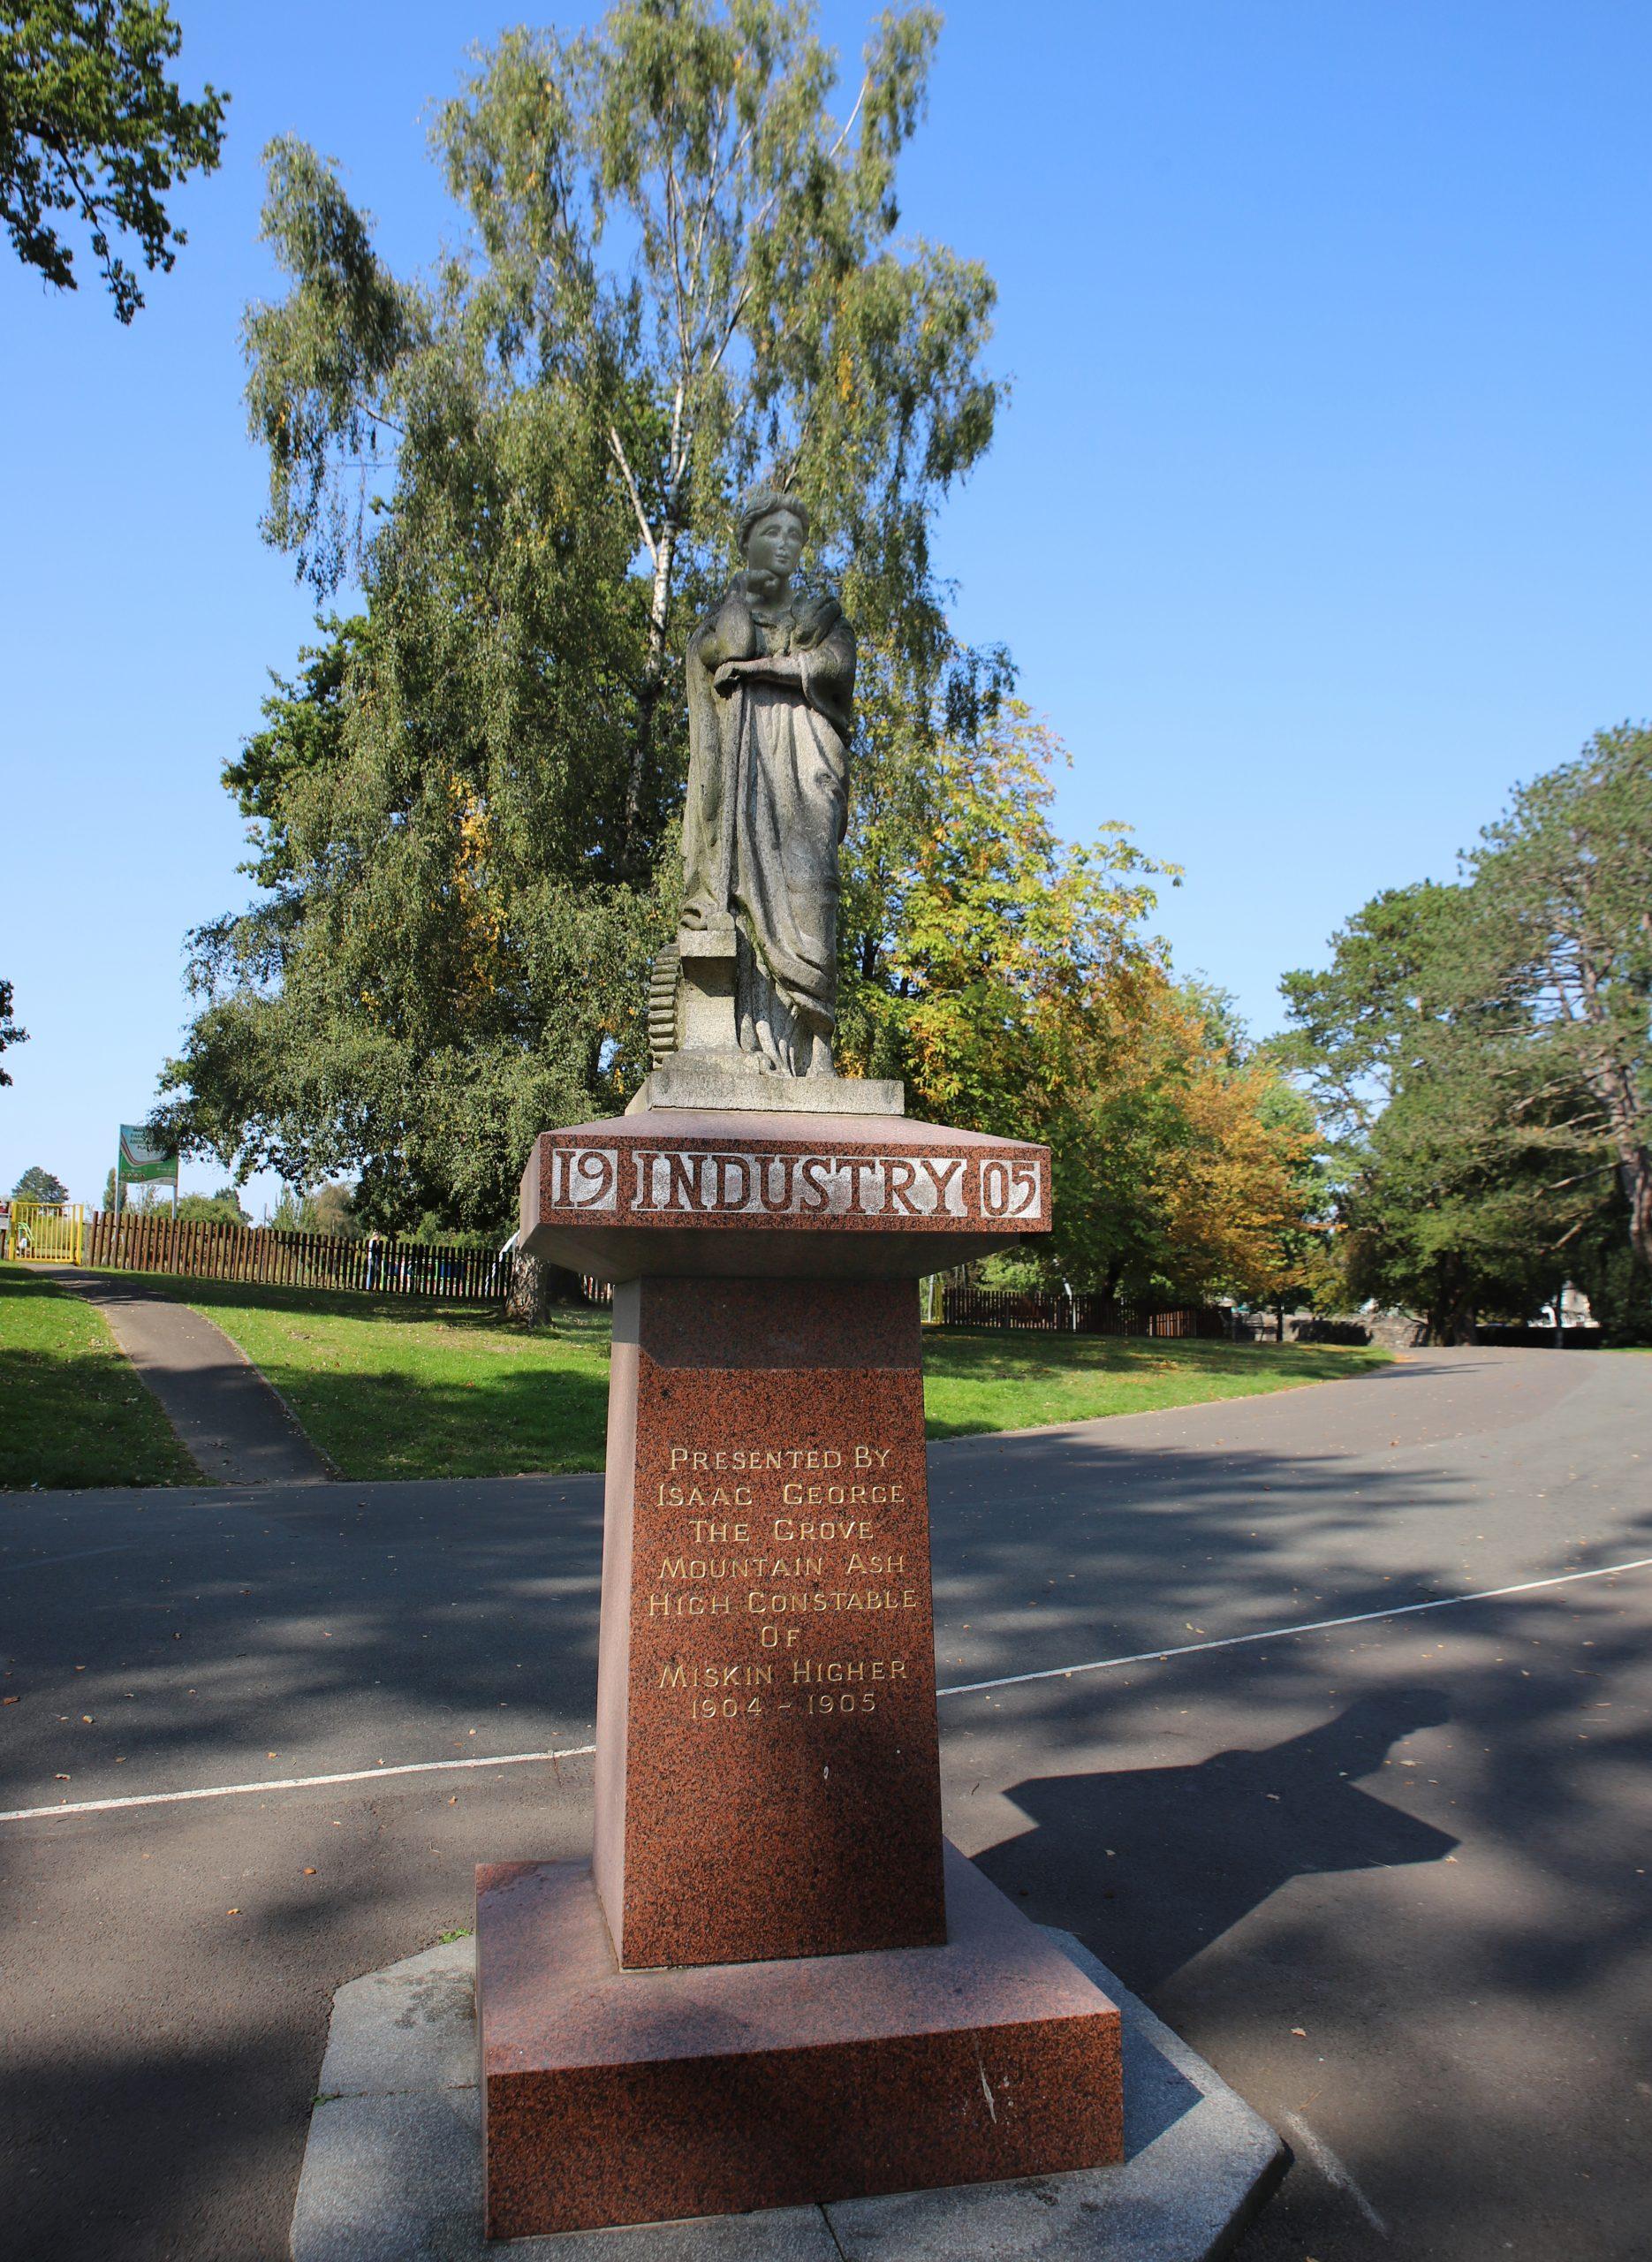 Statue of figure on earthy coloured plinth